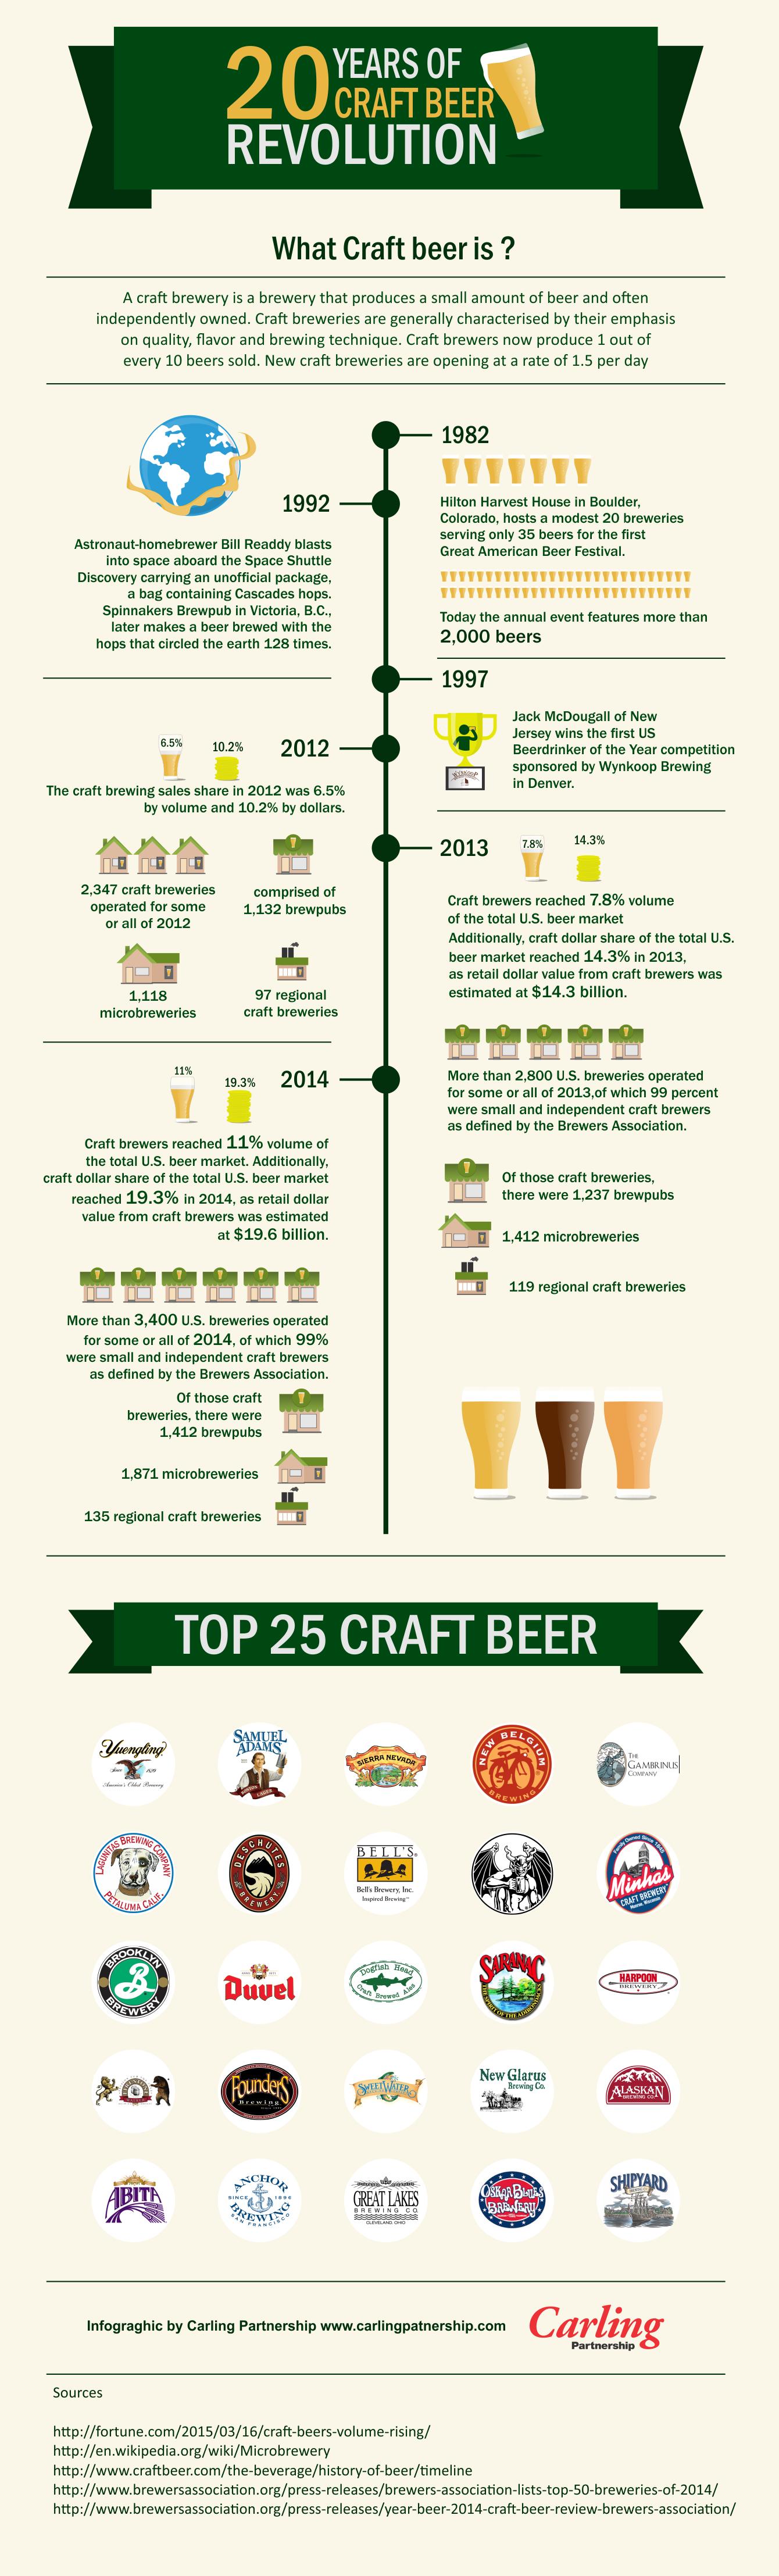 20-years-of-craft-beer-revolution